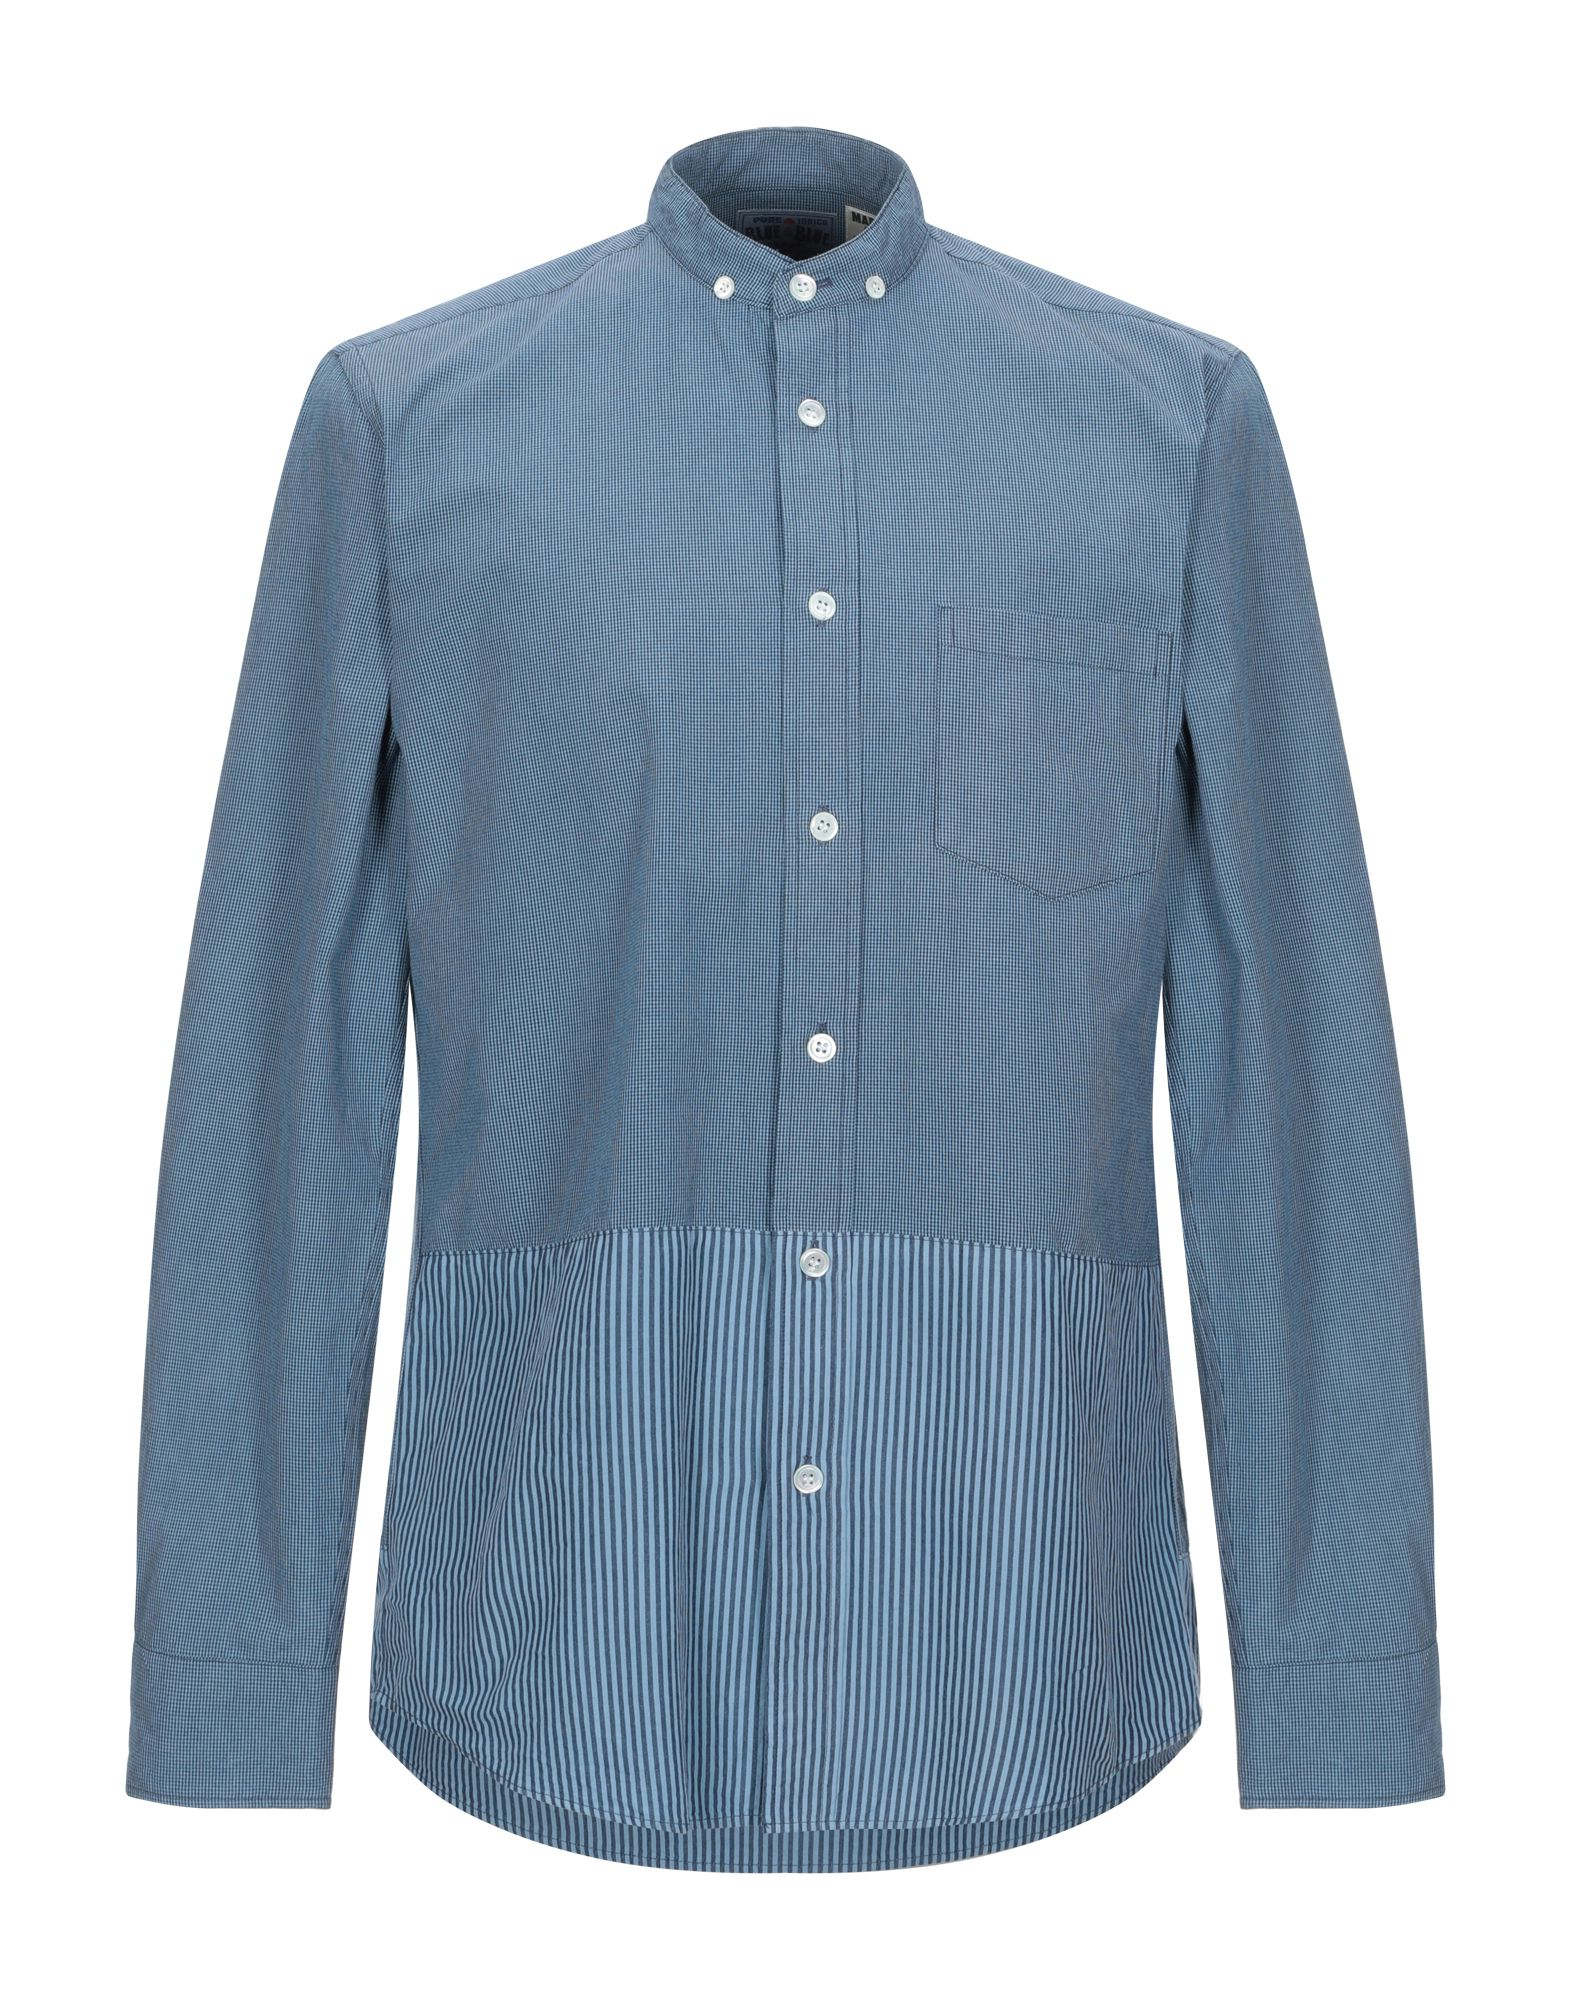 Camicia A Quadri blu blu  Japan uomo uomo - 38858505EU